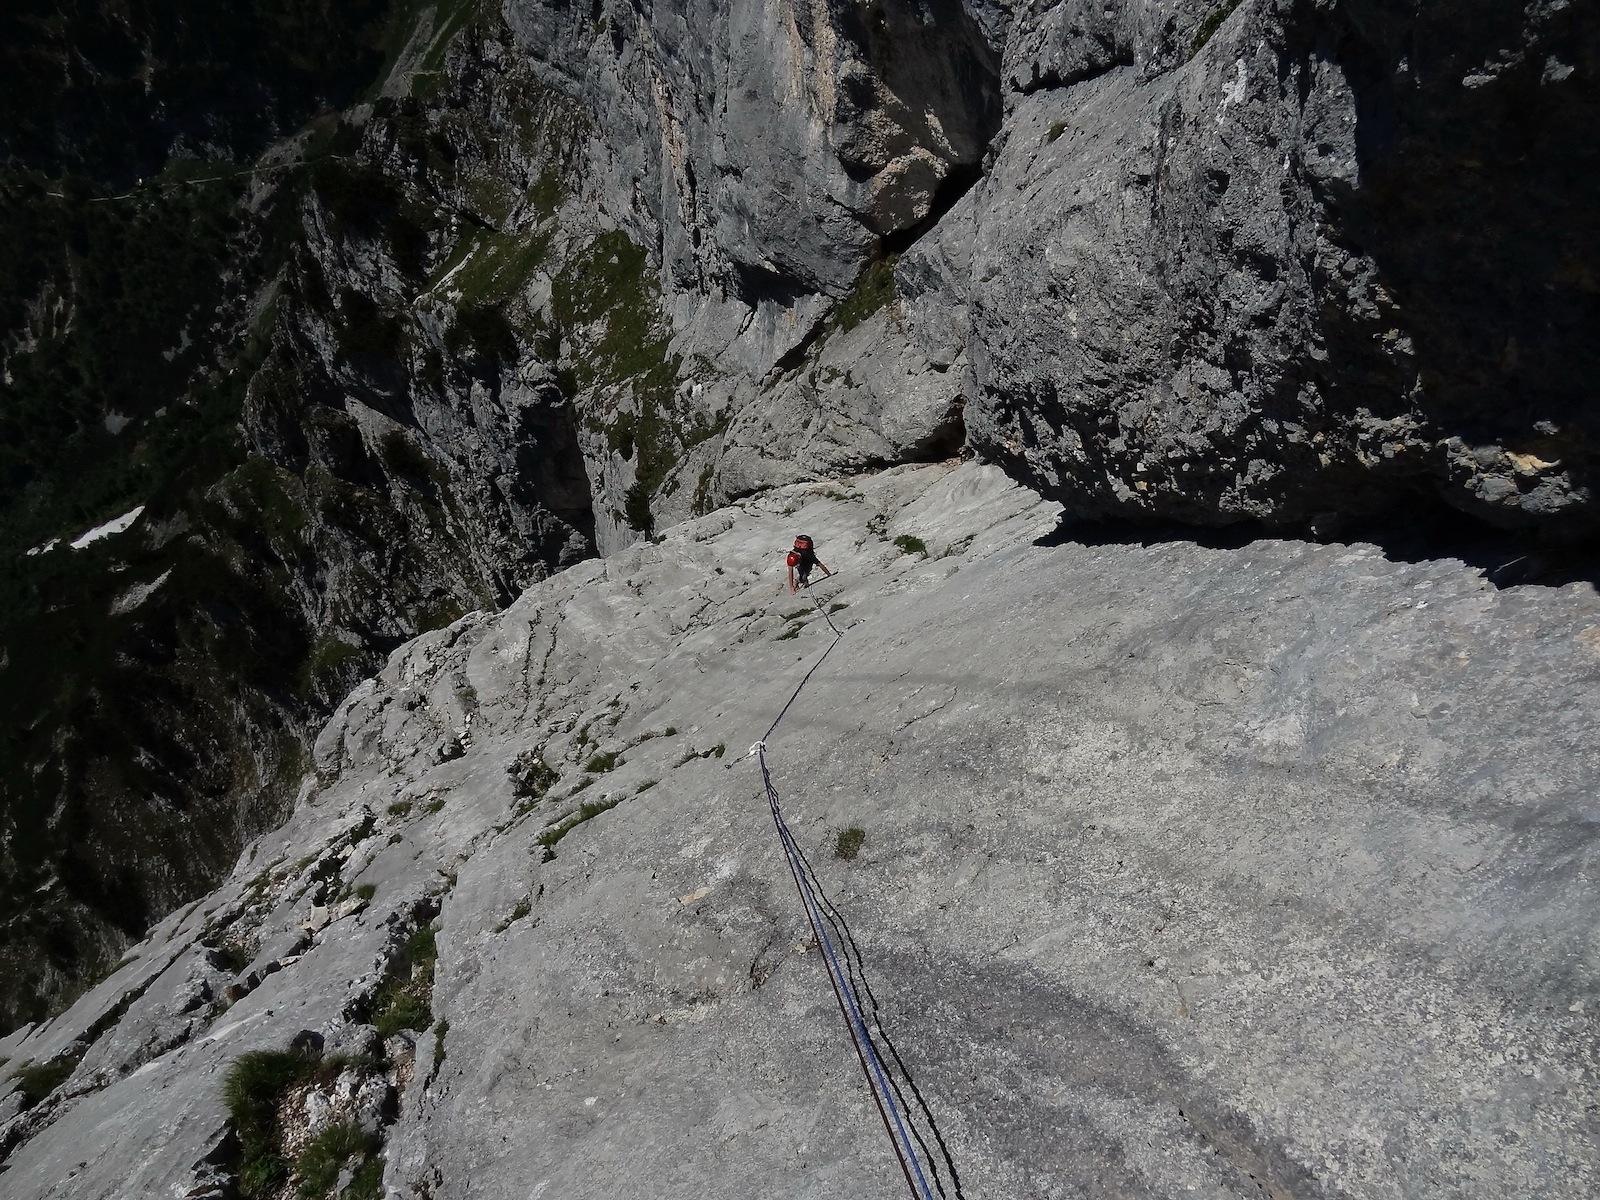 20120616 - Berchtesgadener Hochthron Lampi 099